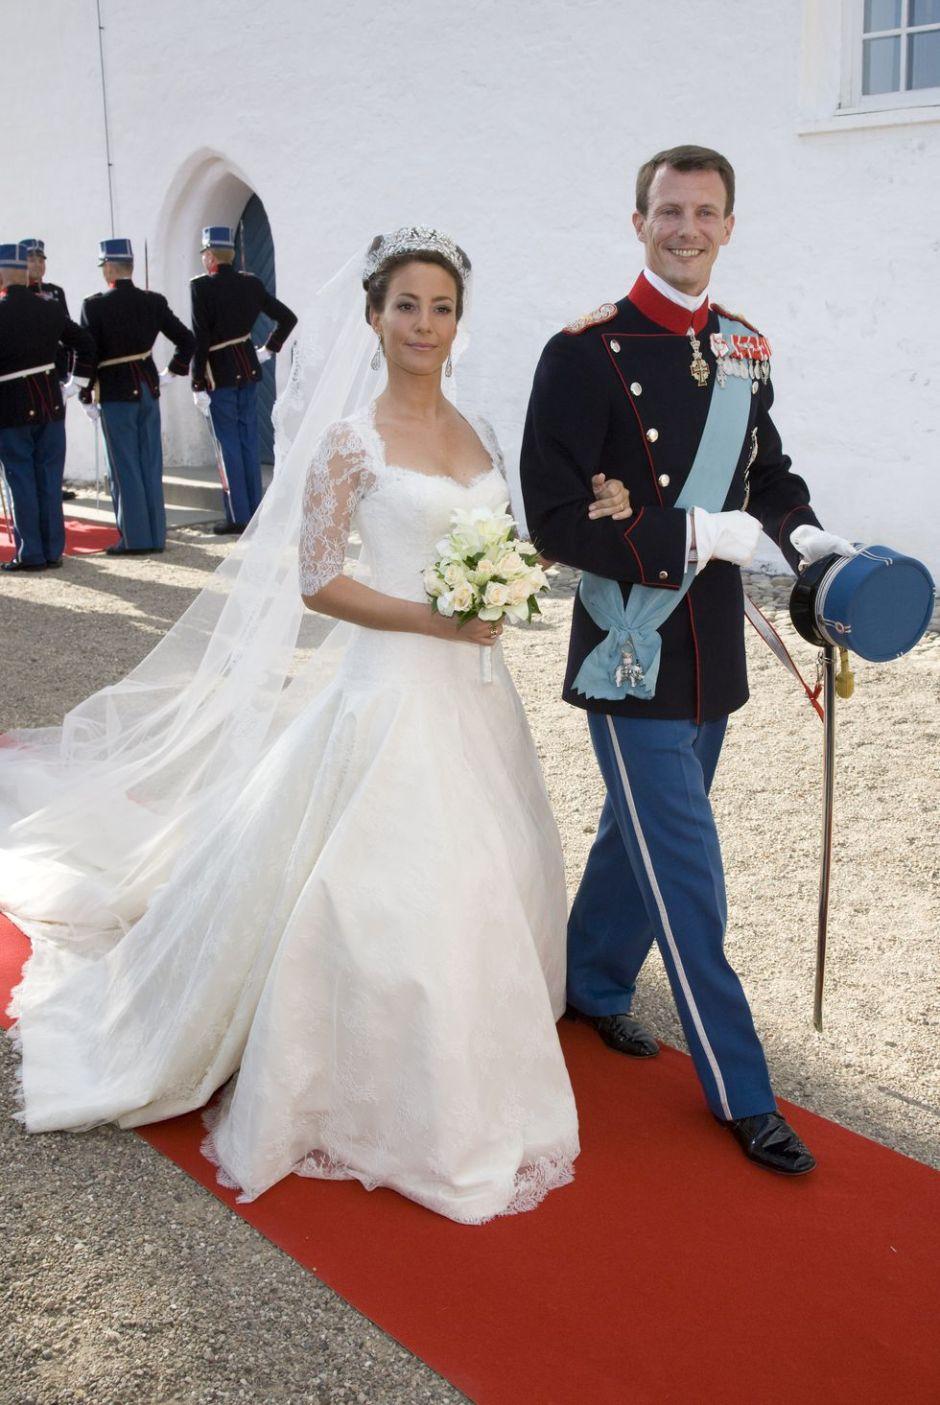 prince-joachim-and-princess-marie-of-denmark-wedding-dress-1516607749